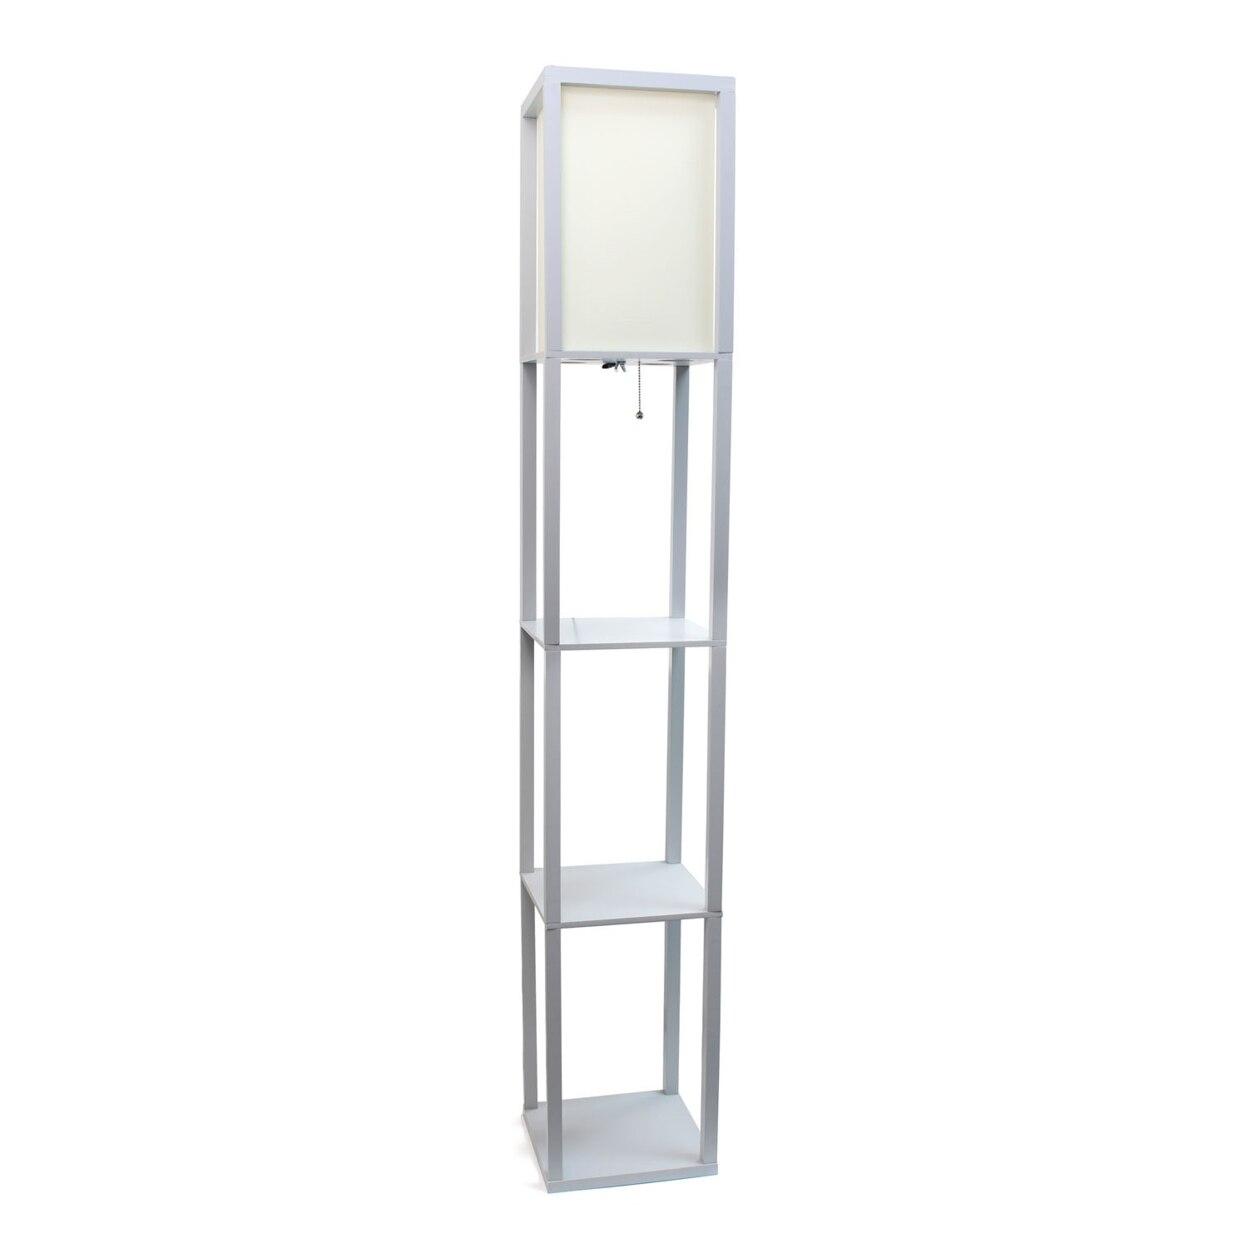 Simple Designs Floor Lamp Etagere Organizer Storage Shelf Linen Shade - Additional Colors